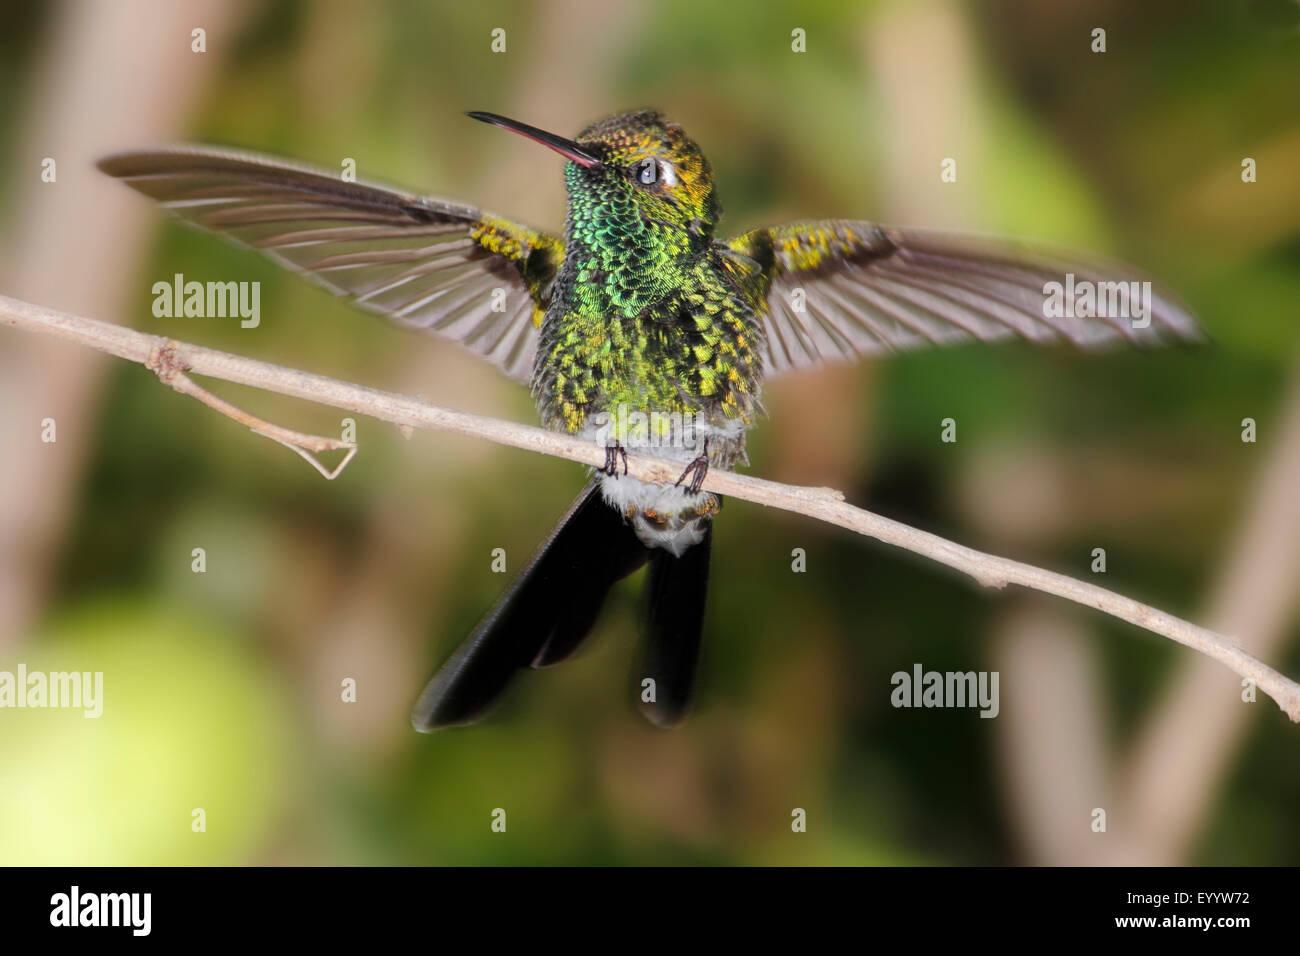 Cuban emerald (Chlorostilbon ricordii), bird is sitting on a branch spreading its wings, Cuba - Stock Image